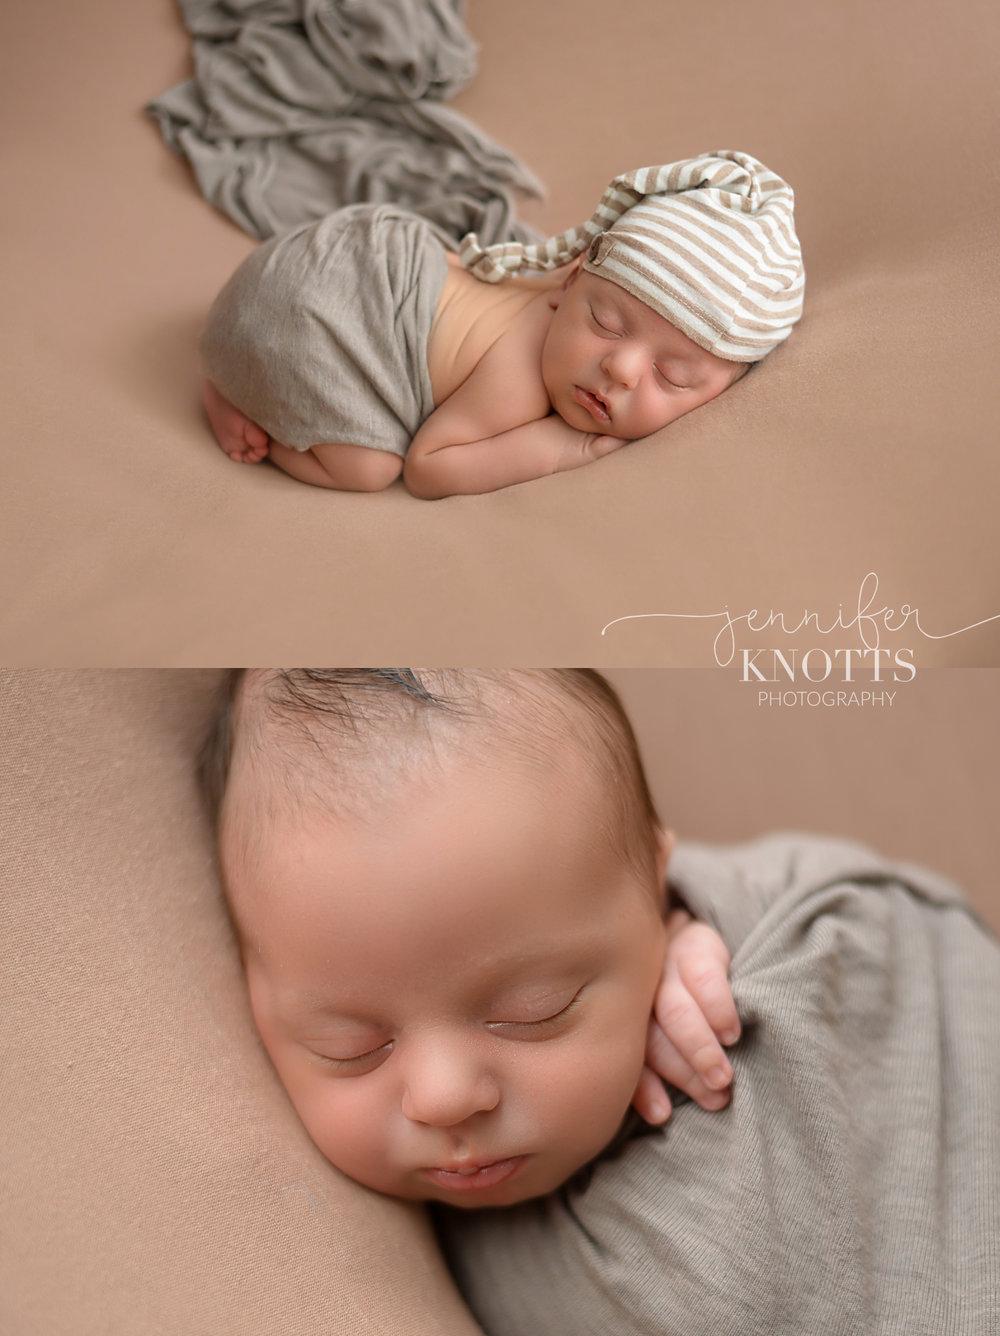 Wilmington nc newborn photographer captures sleeping newborn boy in neutral colors